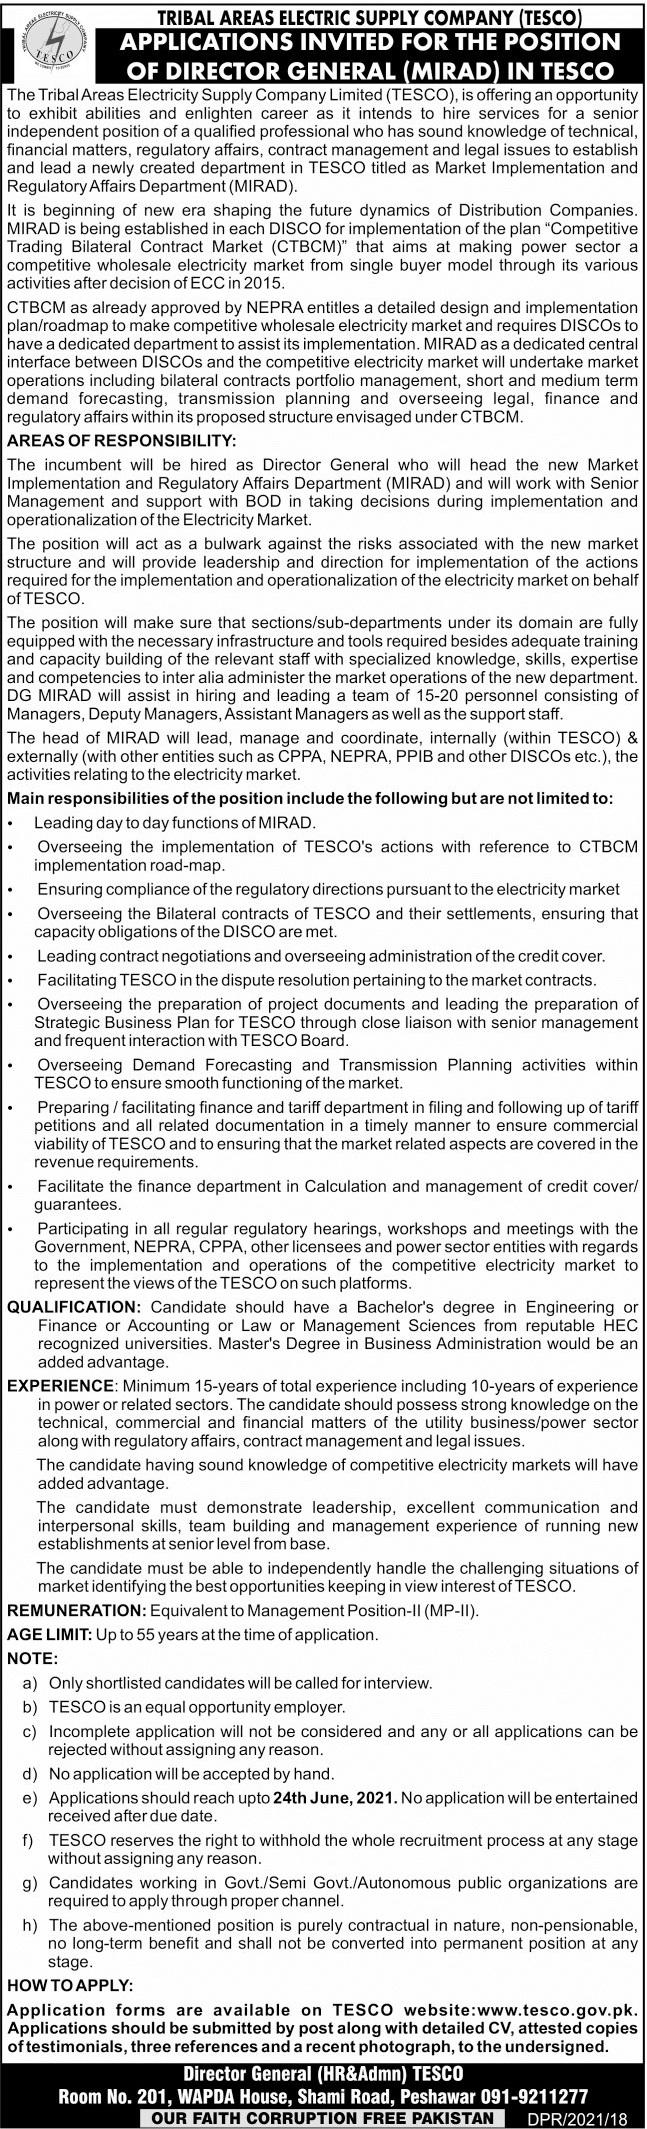 TESCO Jobs Peshawar 2021 at Tribal Electric Supply Company